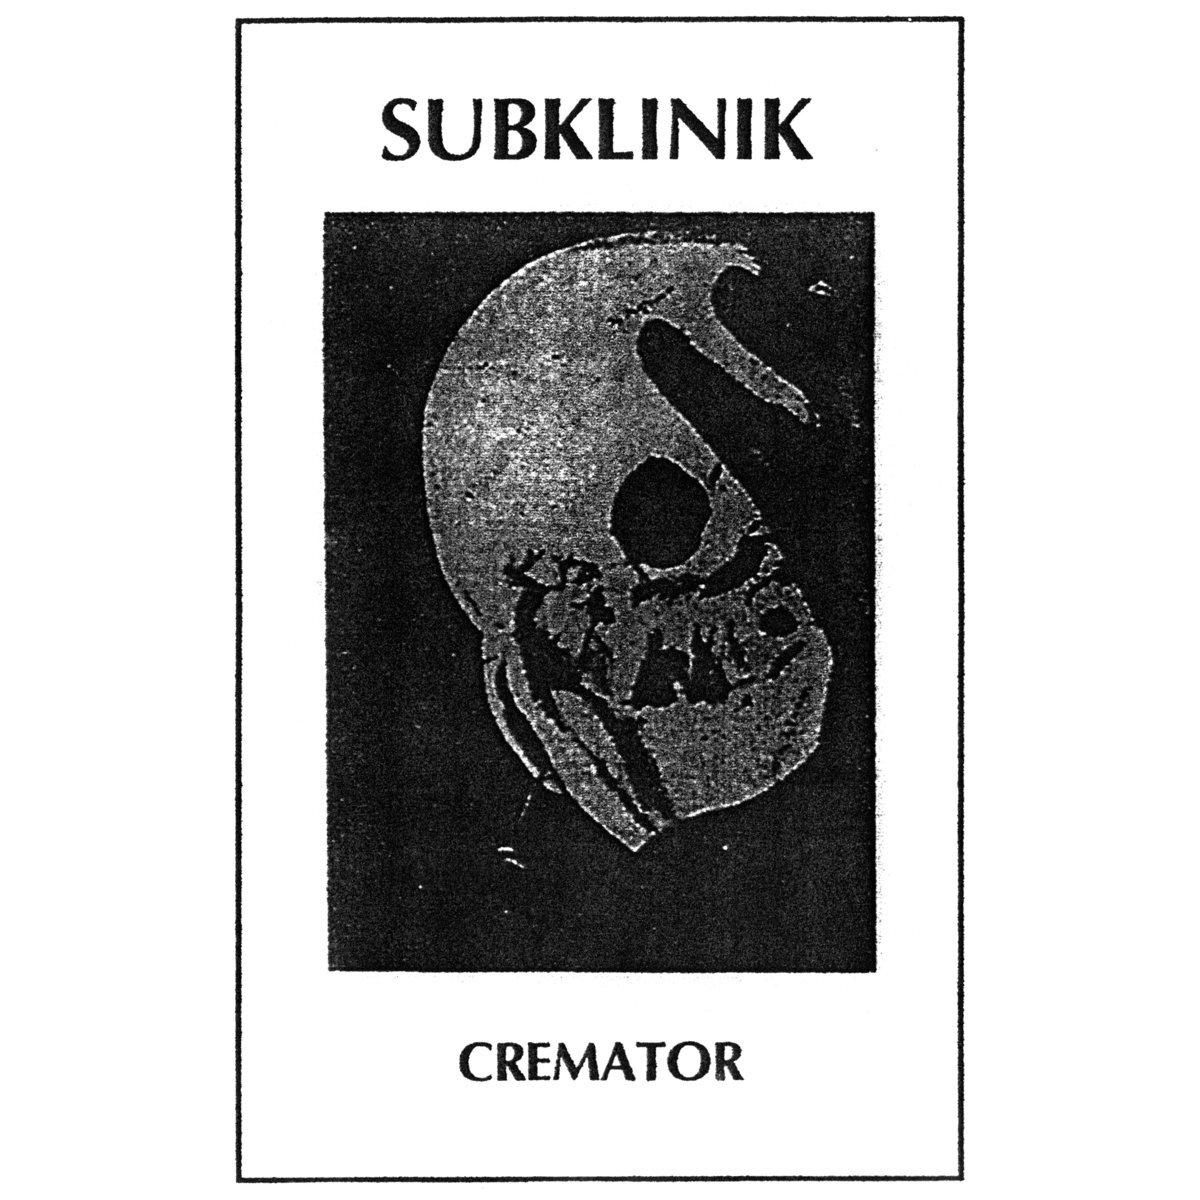 Subklinik - Cremator - 画像1